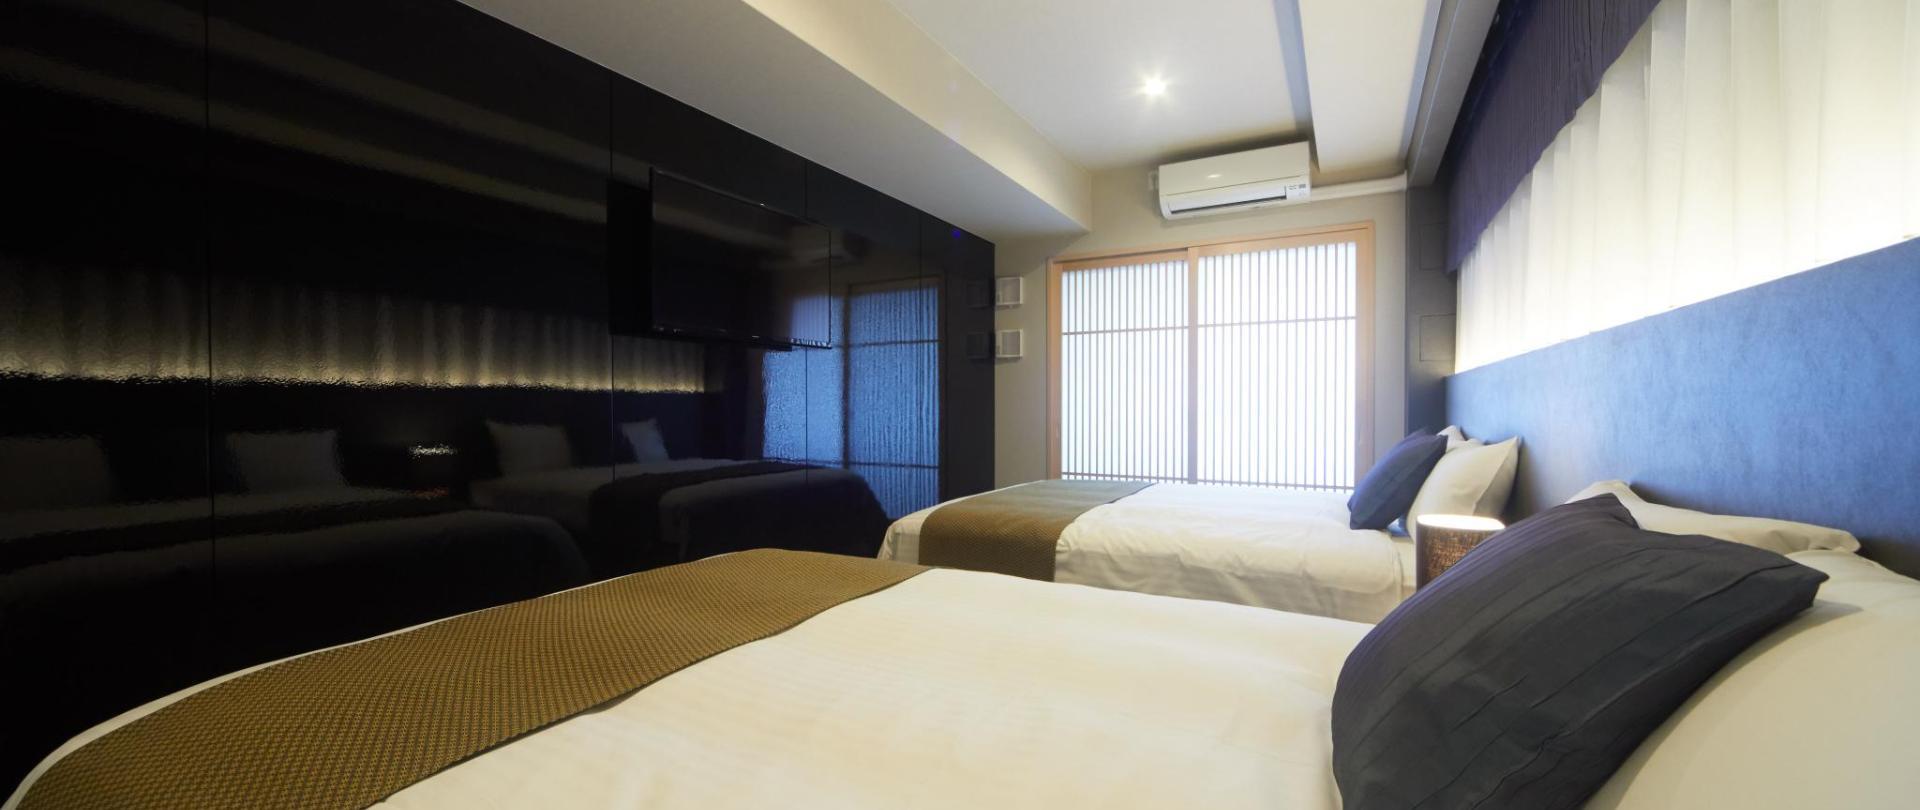 181217_HotelMondonce_142.jpg